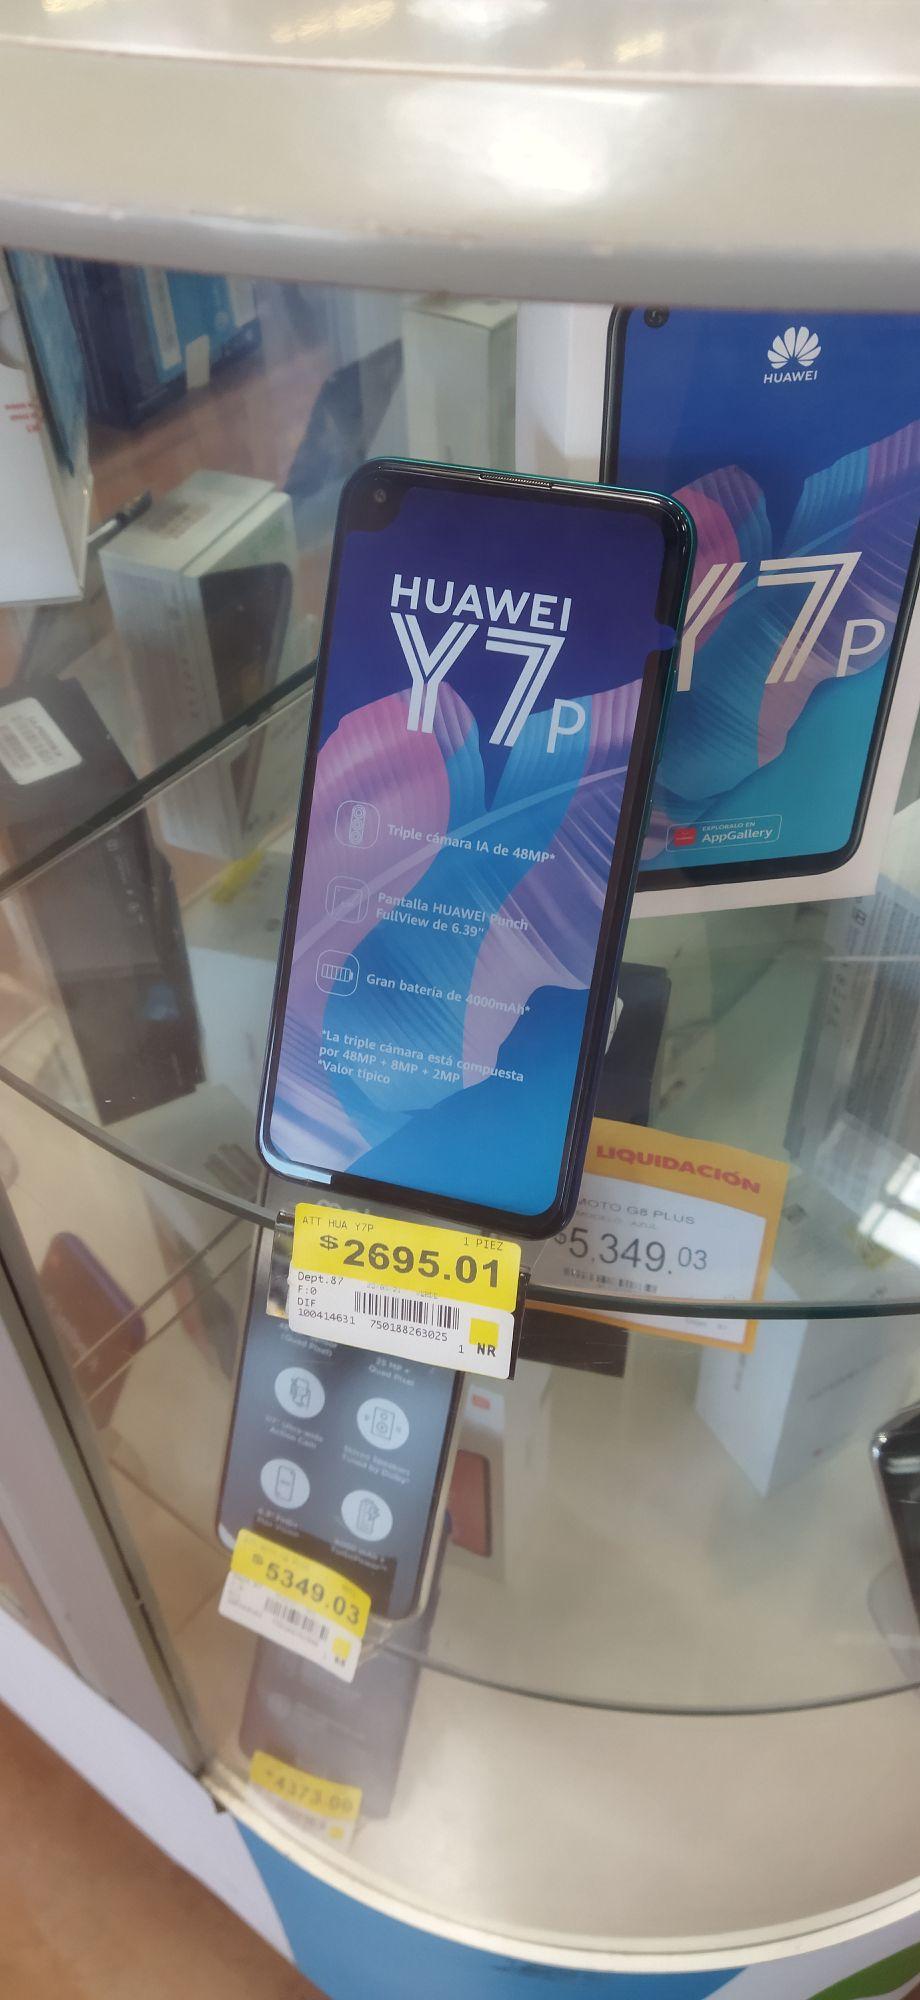 Walmart: Huawei Y7P (ATT)